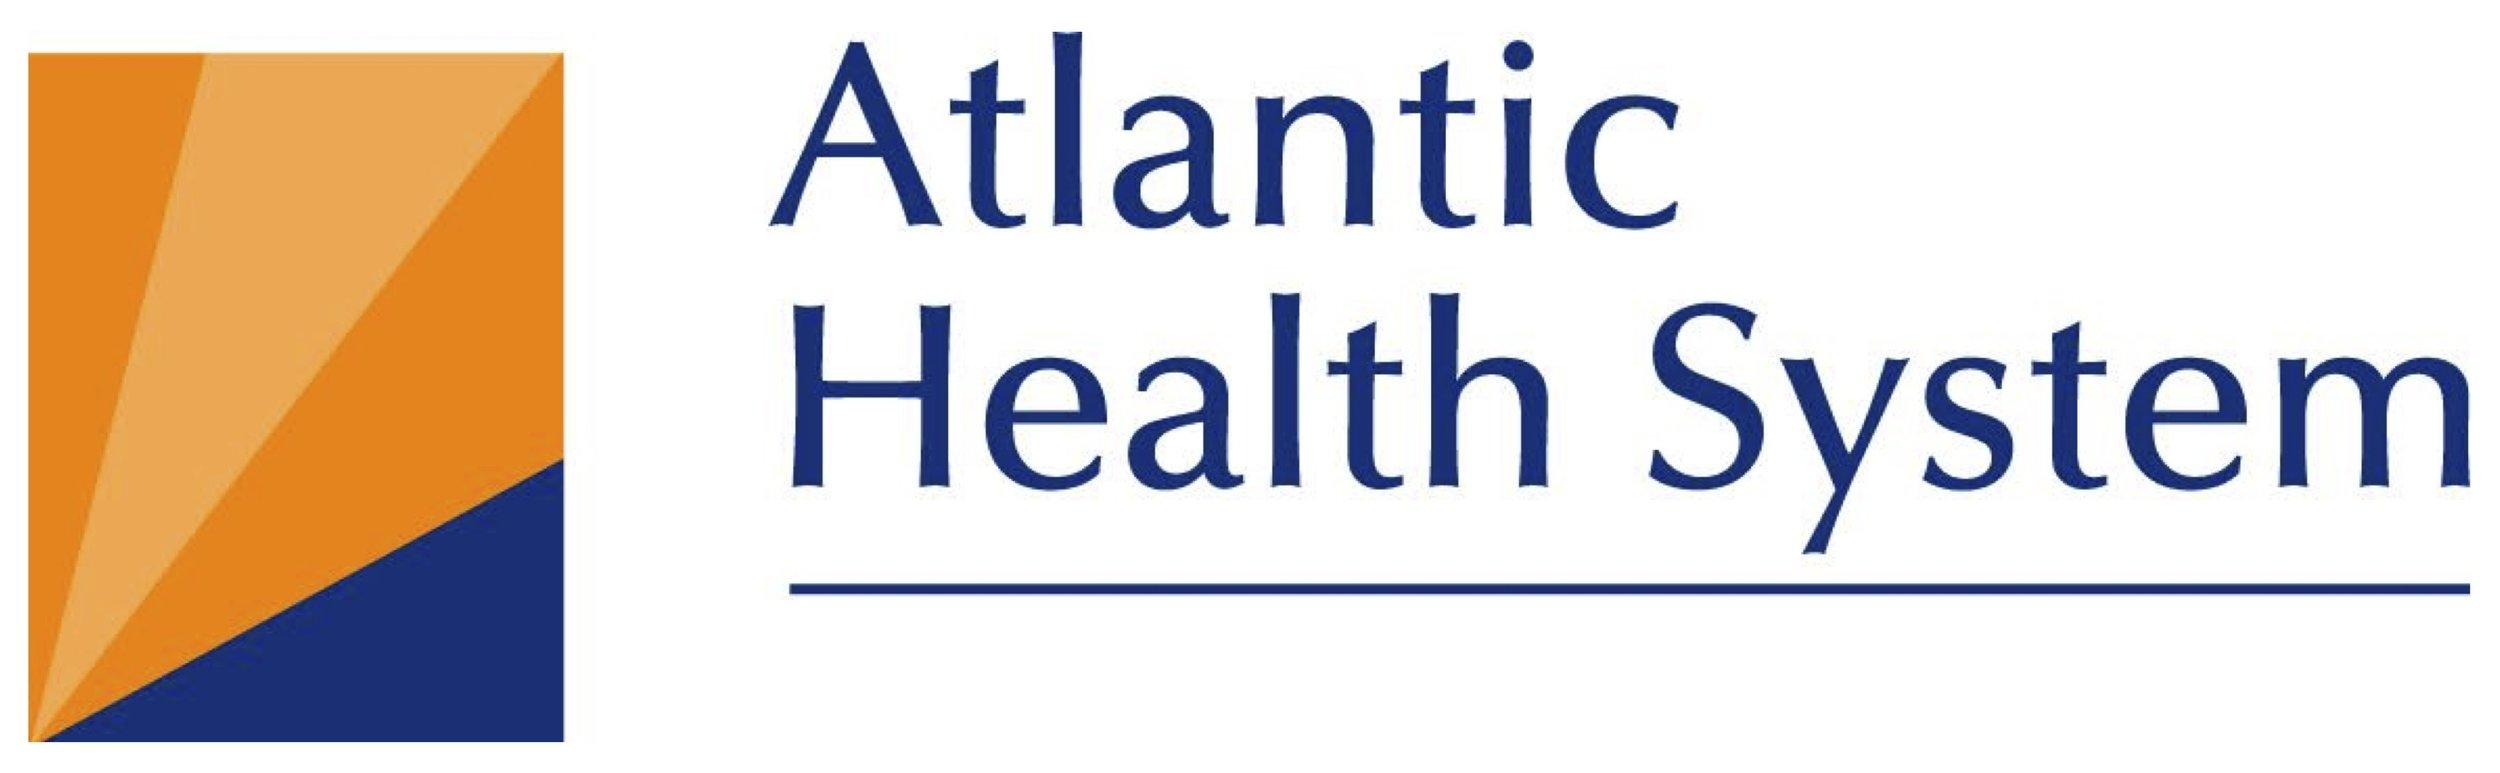 Atlantic Health System Logo Image.jpg